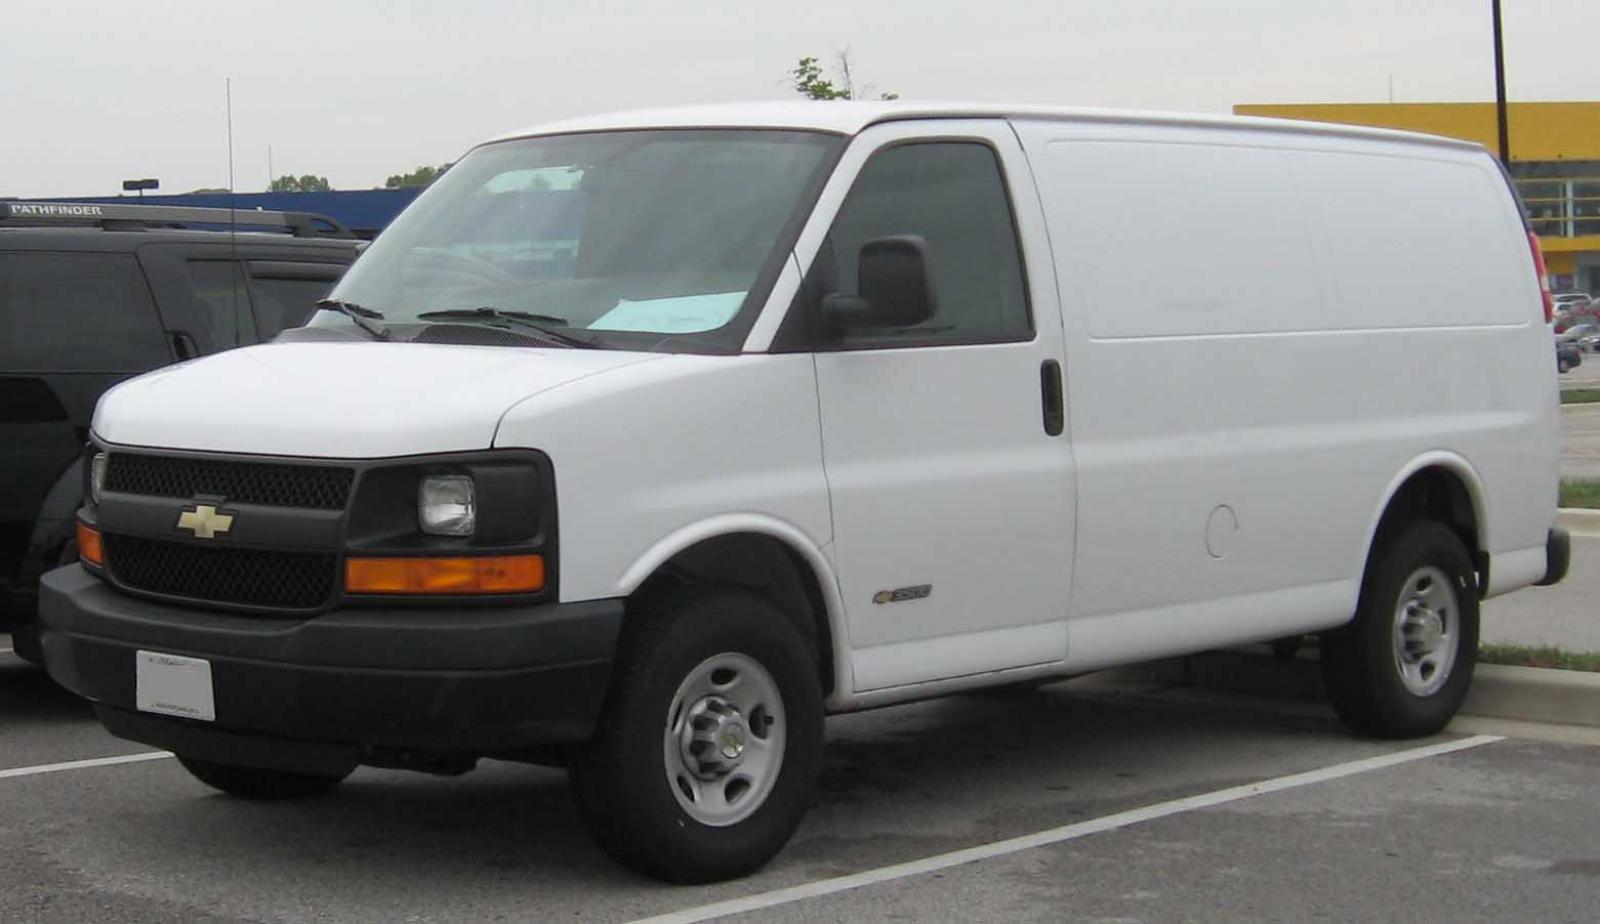 800 1024 1280 1600 origin 1998 Chevrolet Express ...